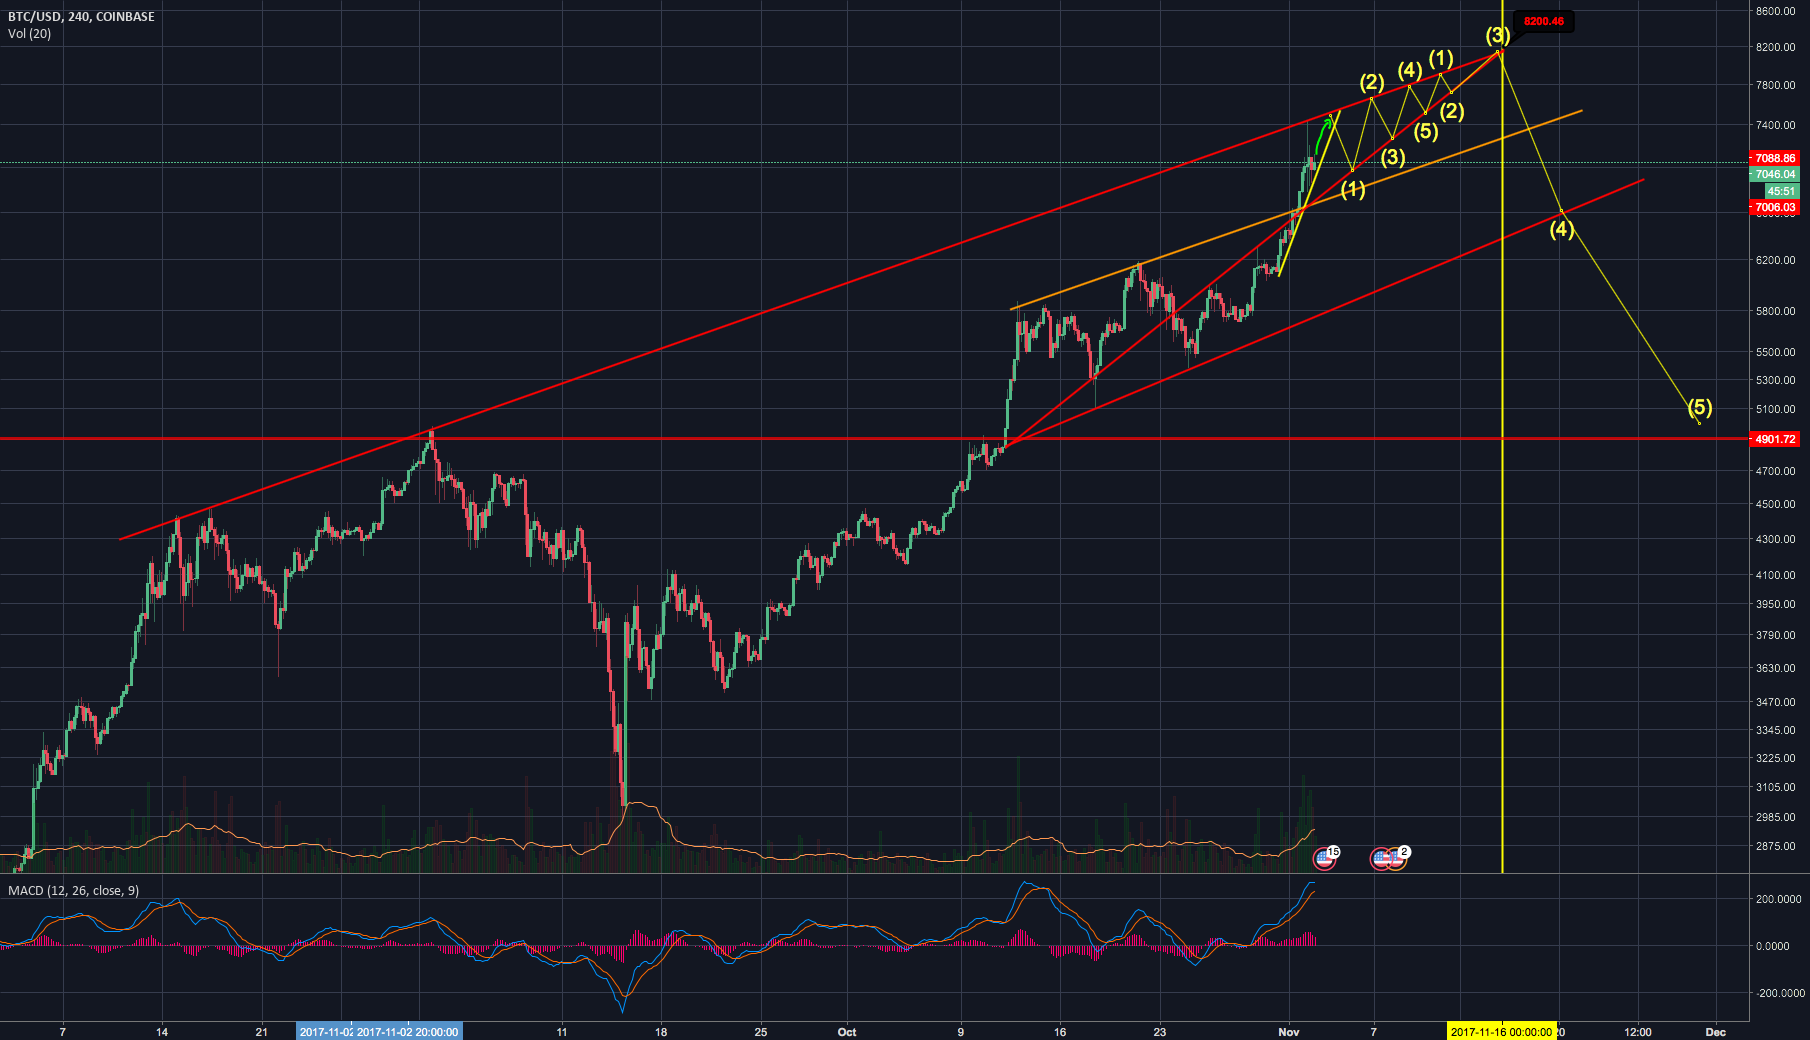 BTC/USD: Bitcoin to $8200 before correction?